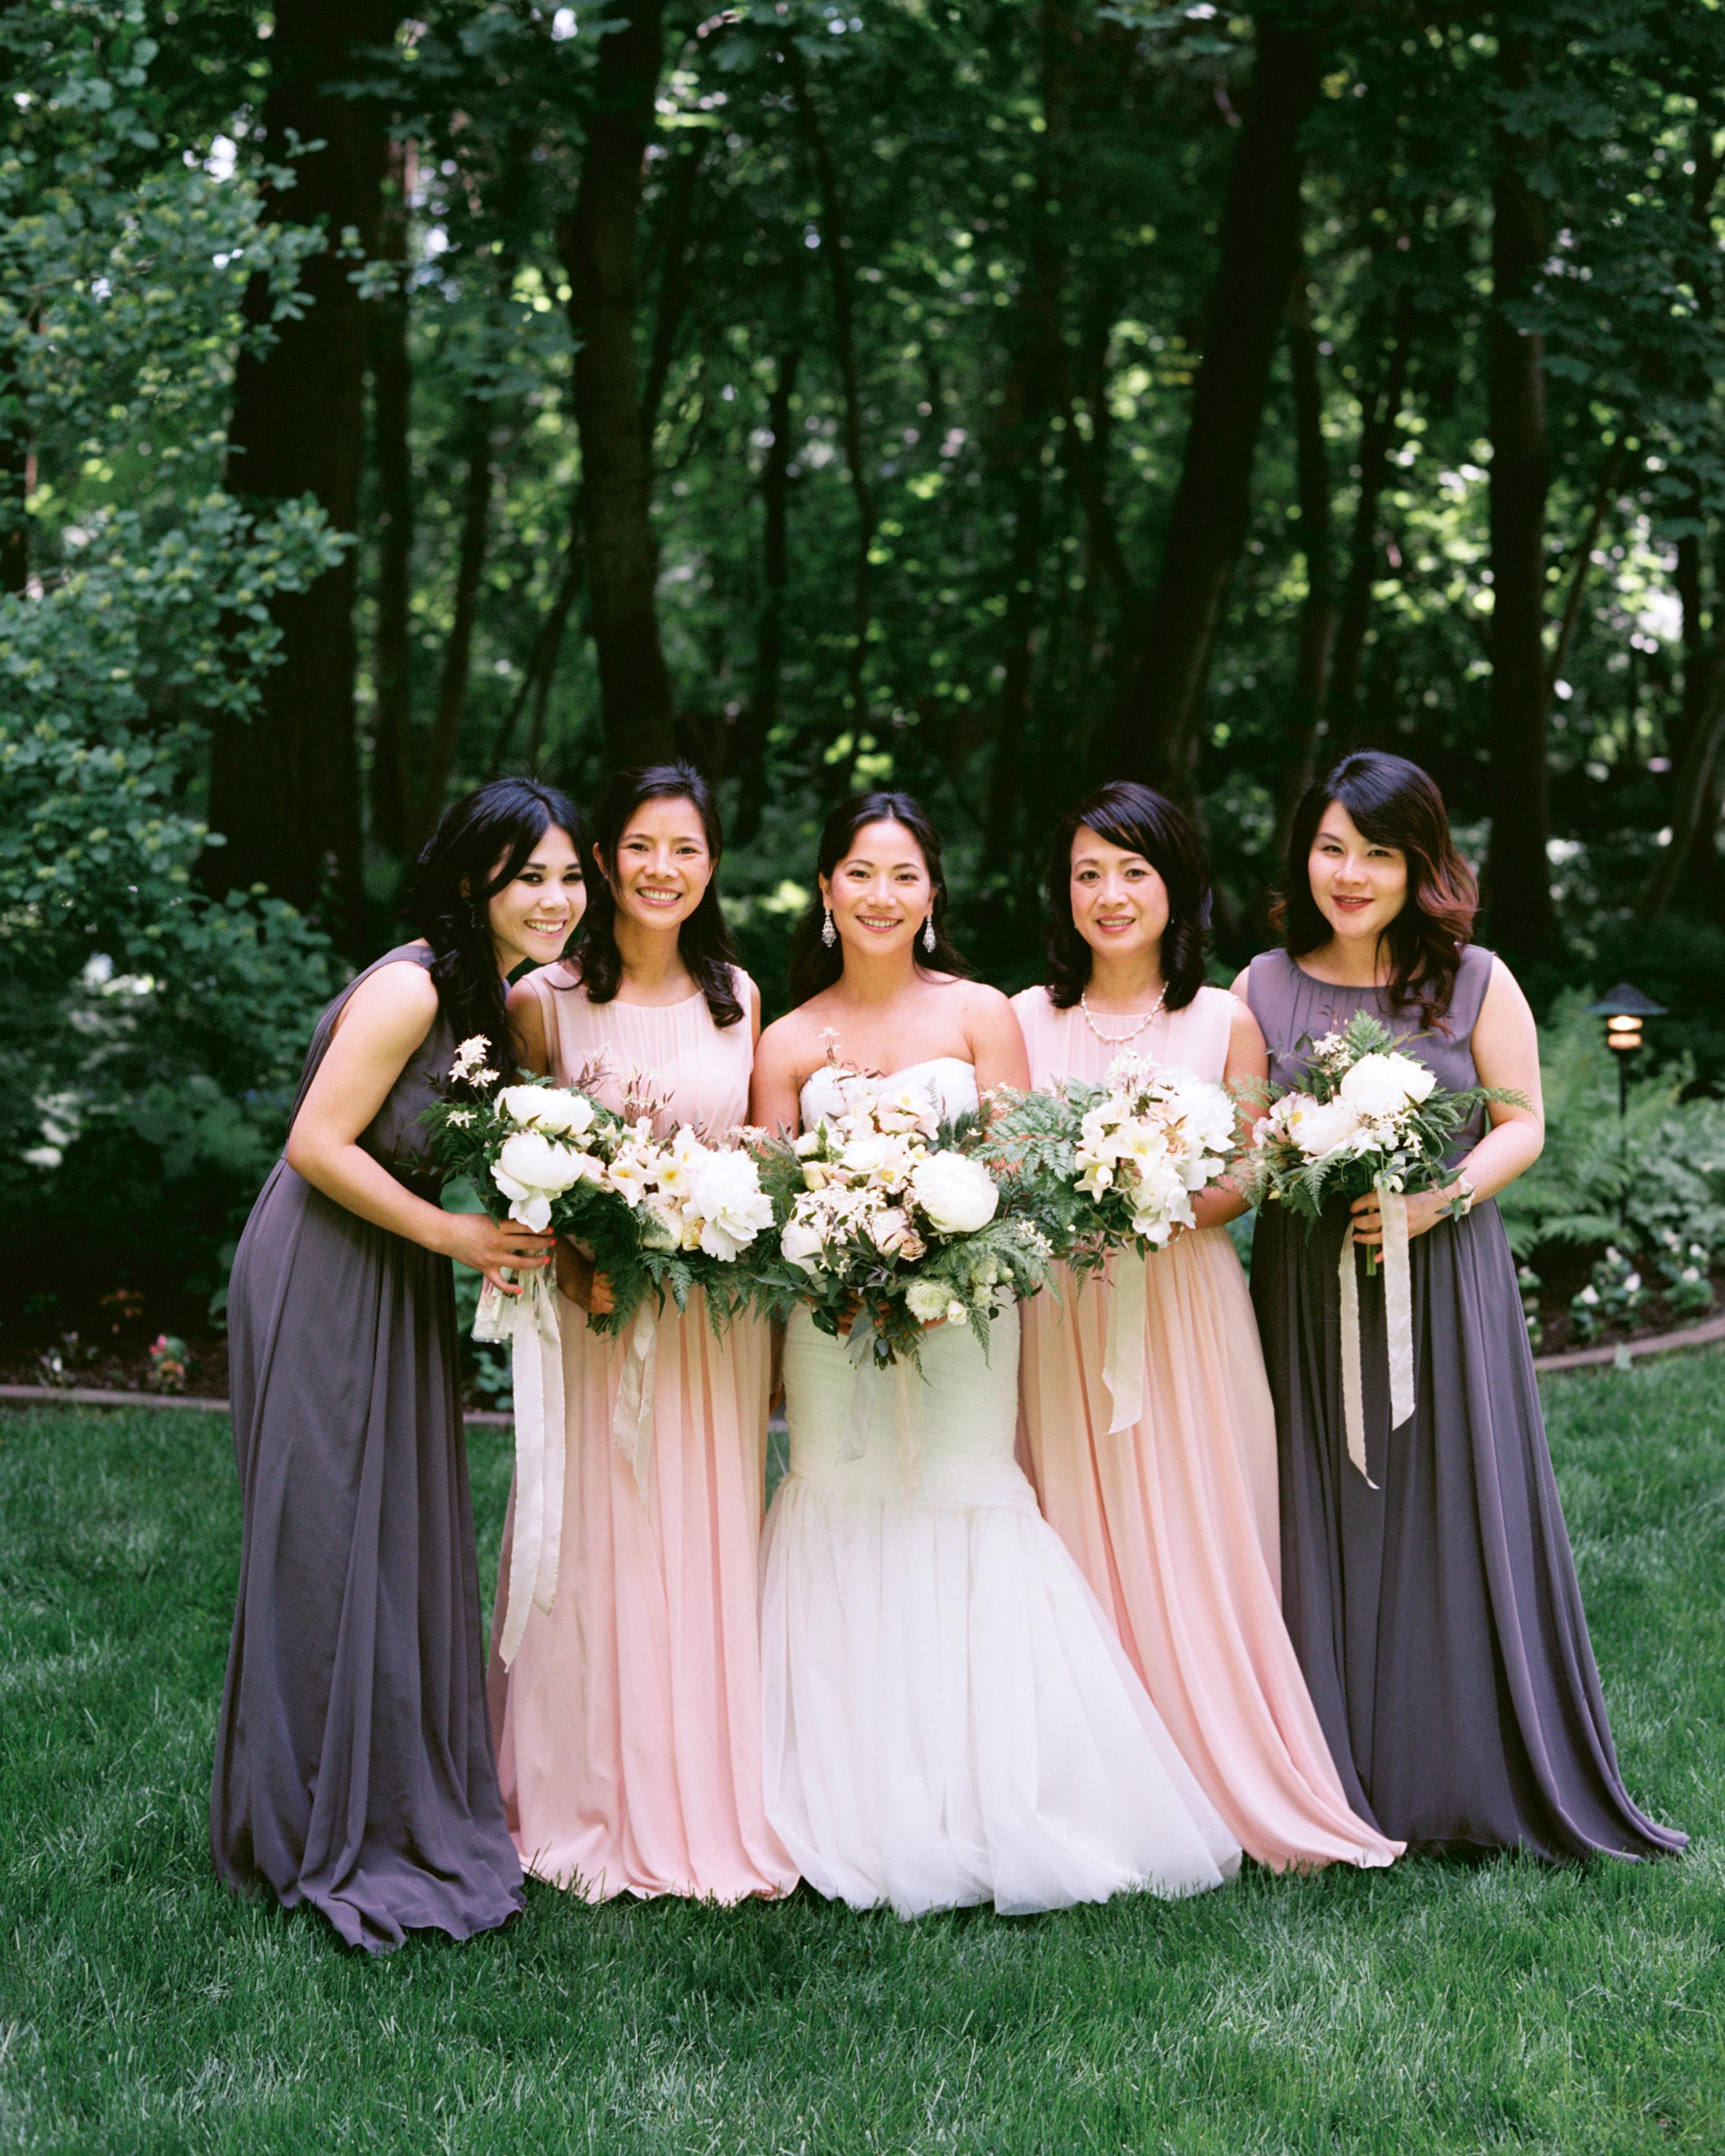 ally-adam-wedding-bridesmaids-034-s111818-0215.jpg